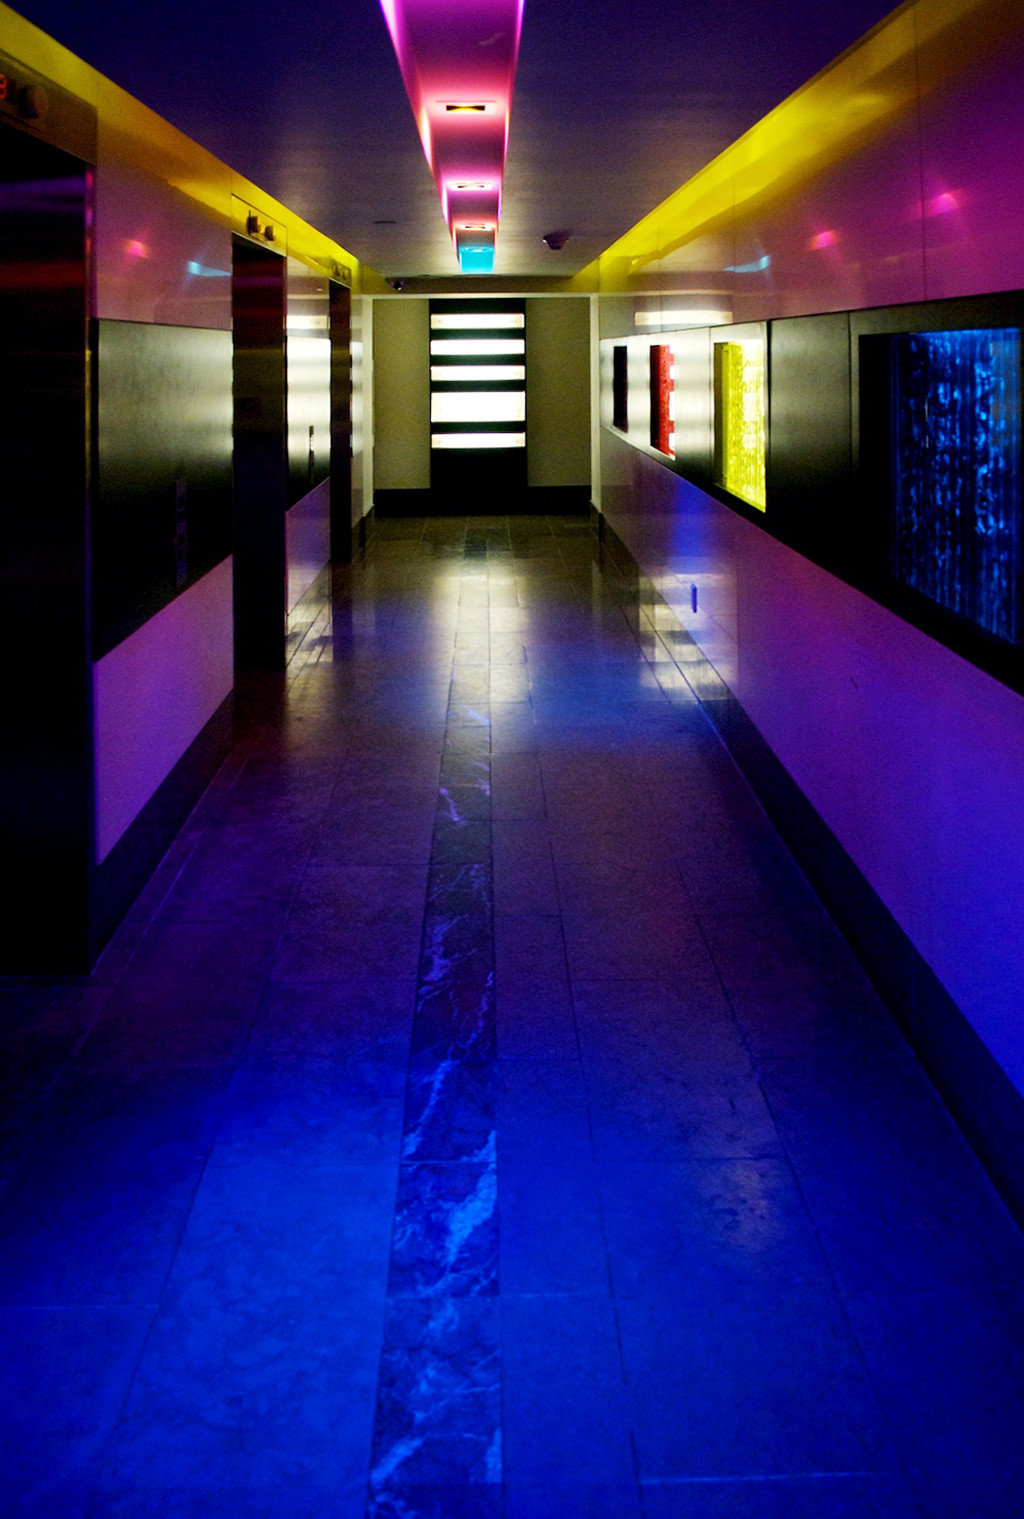 platform light station sport venue sports lighting nightclub screenshot night subway